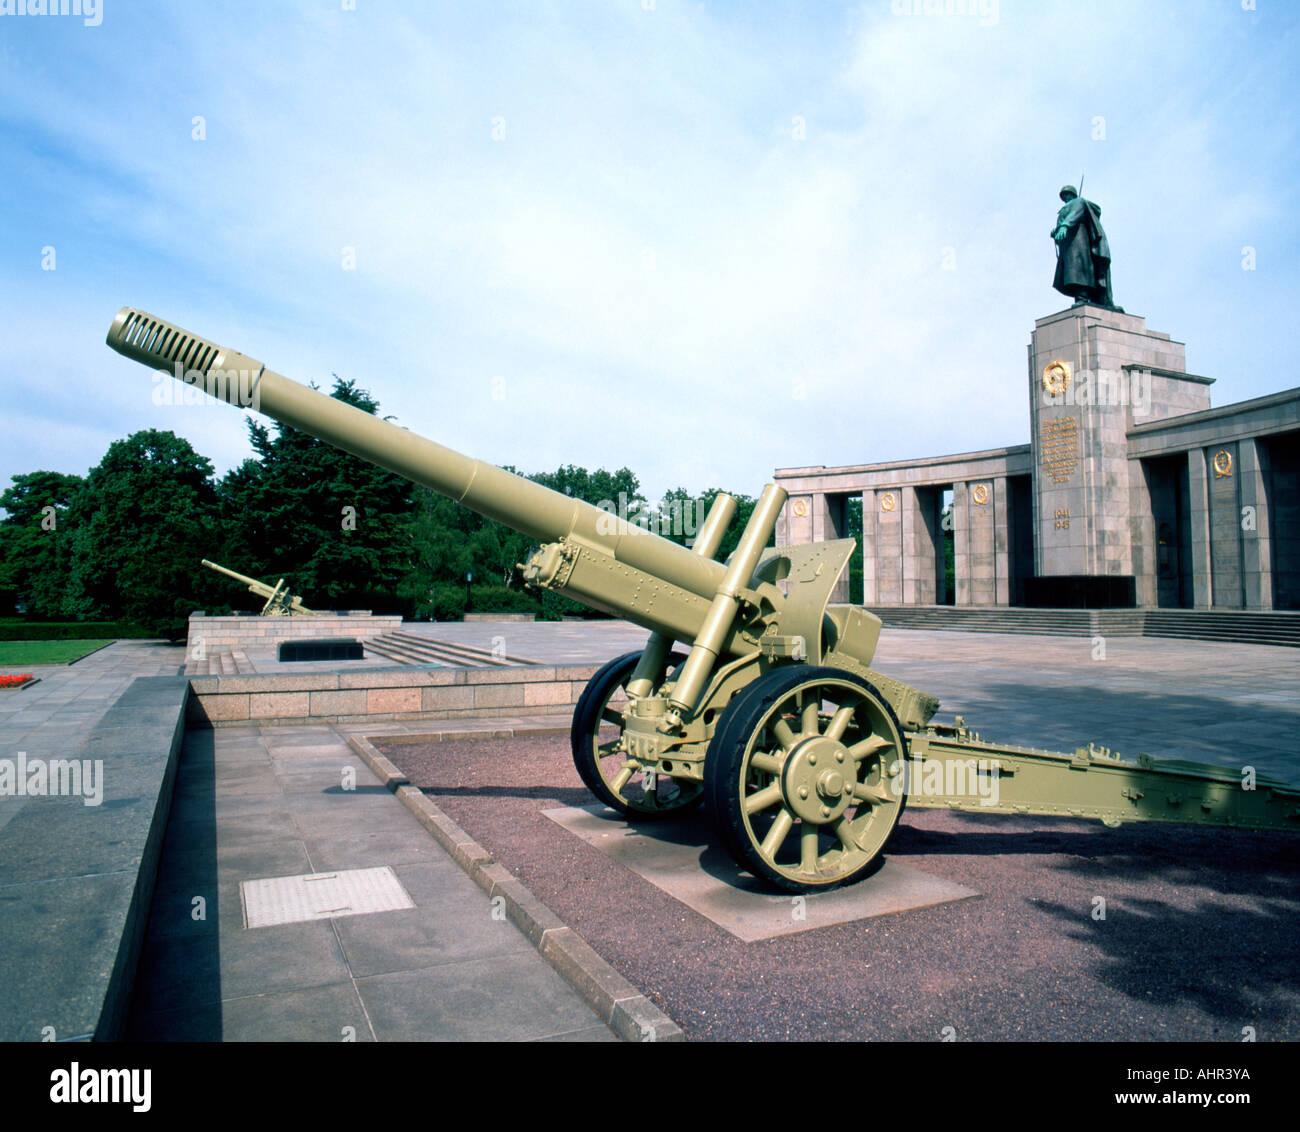 Russisches Kriegsdenkmal, Berlin, Deutschland Stockbild